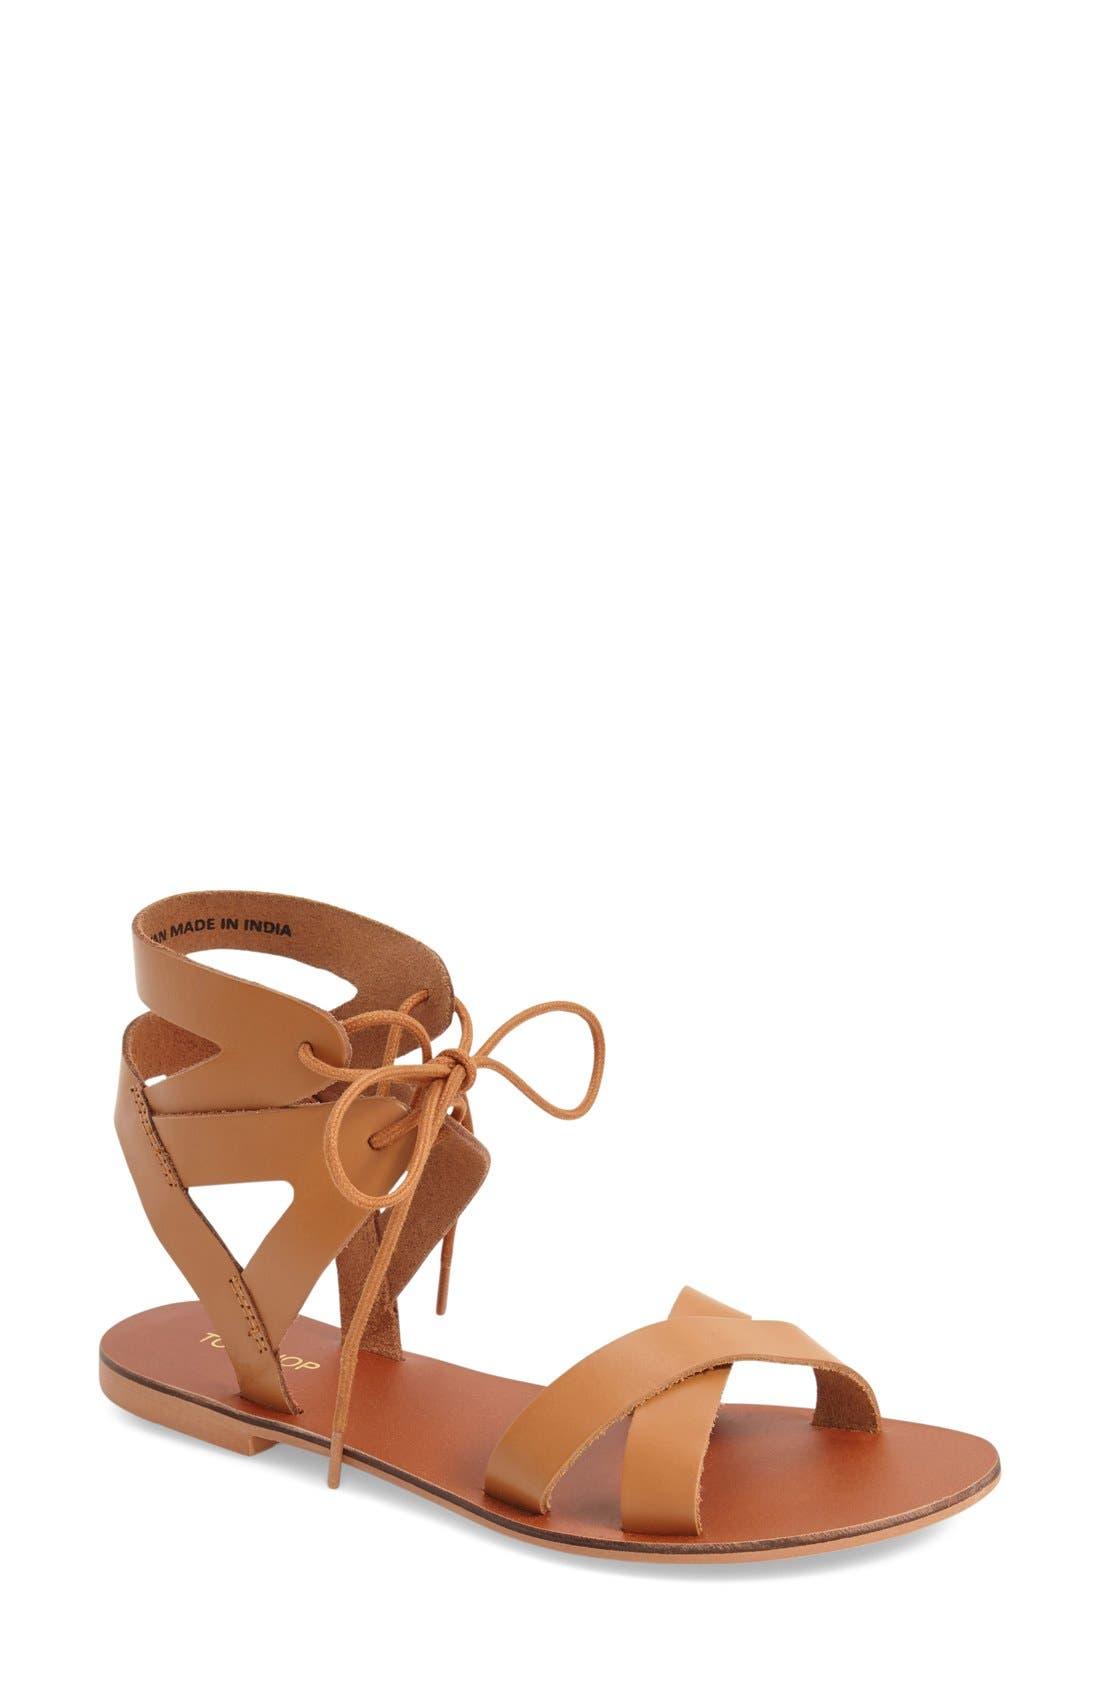 'Herb' Lace-Up Flat Sandal,                         Main,                         color,